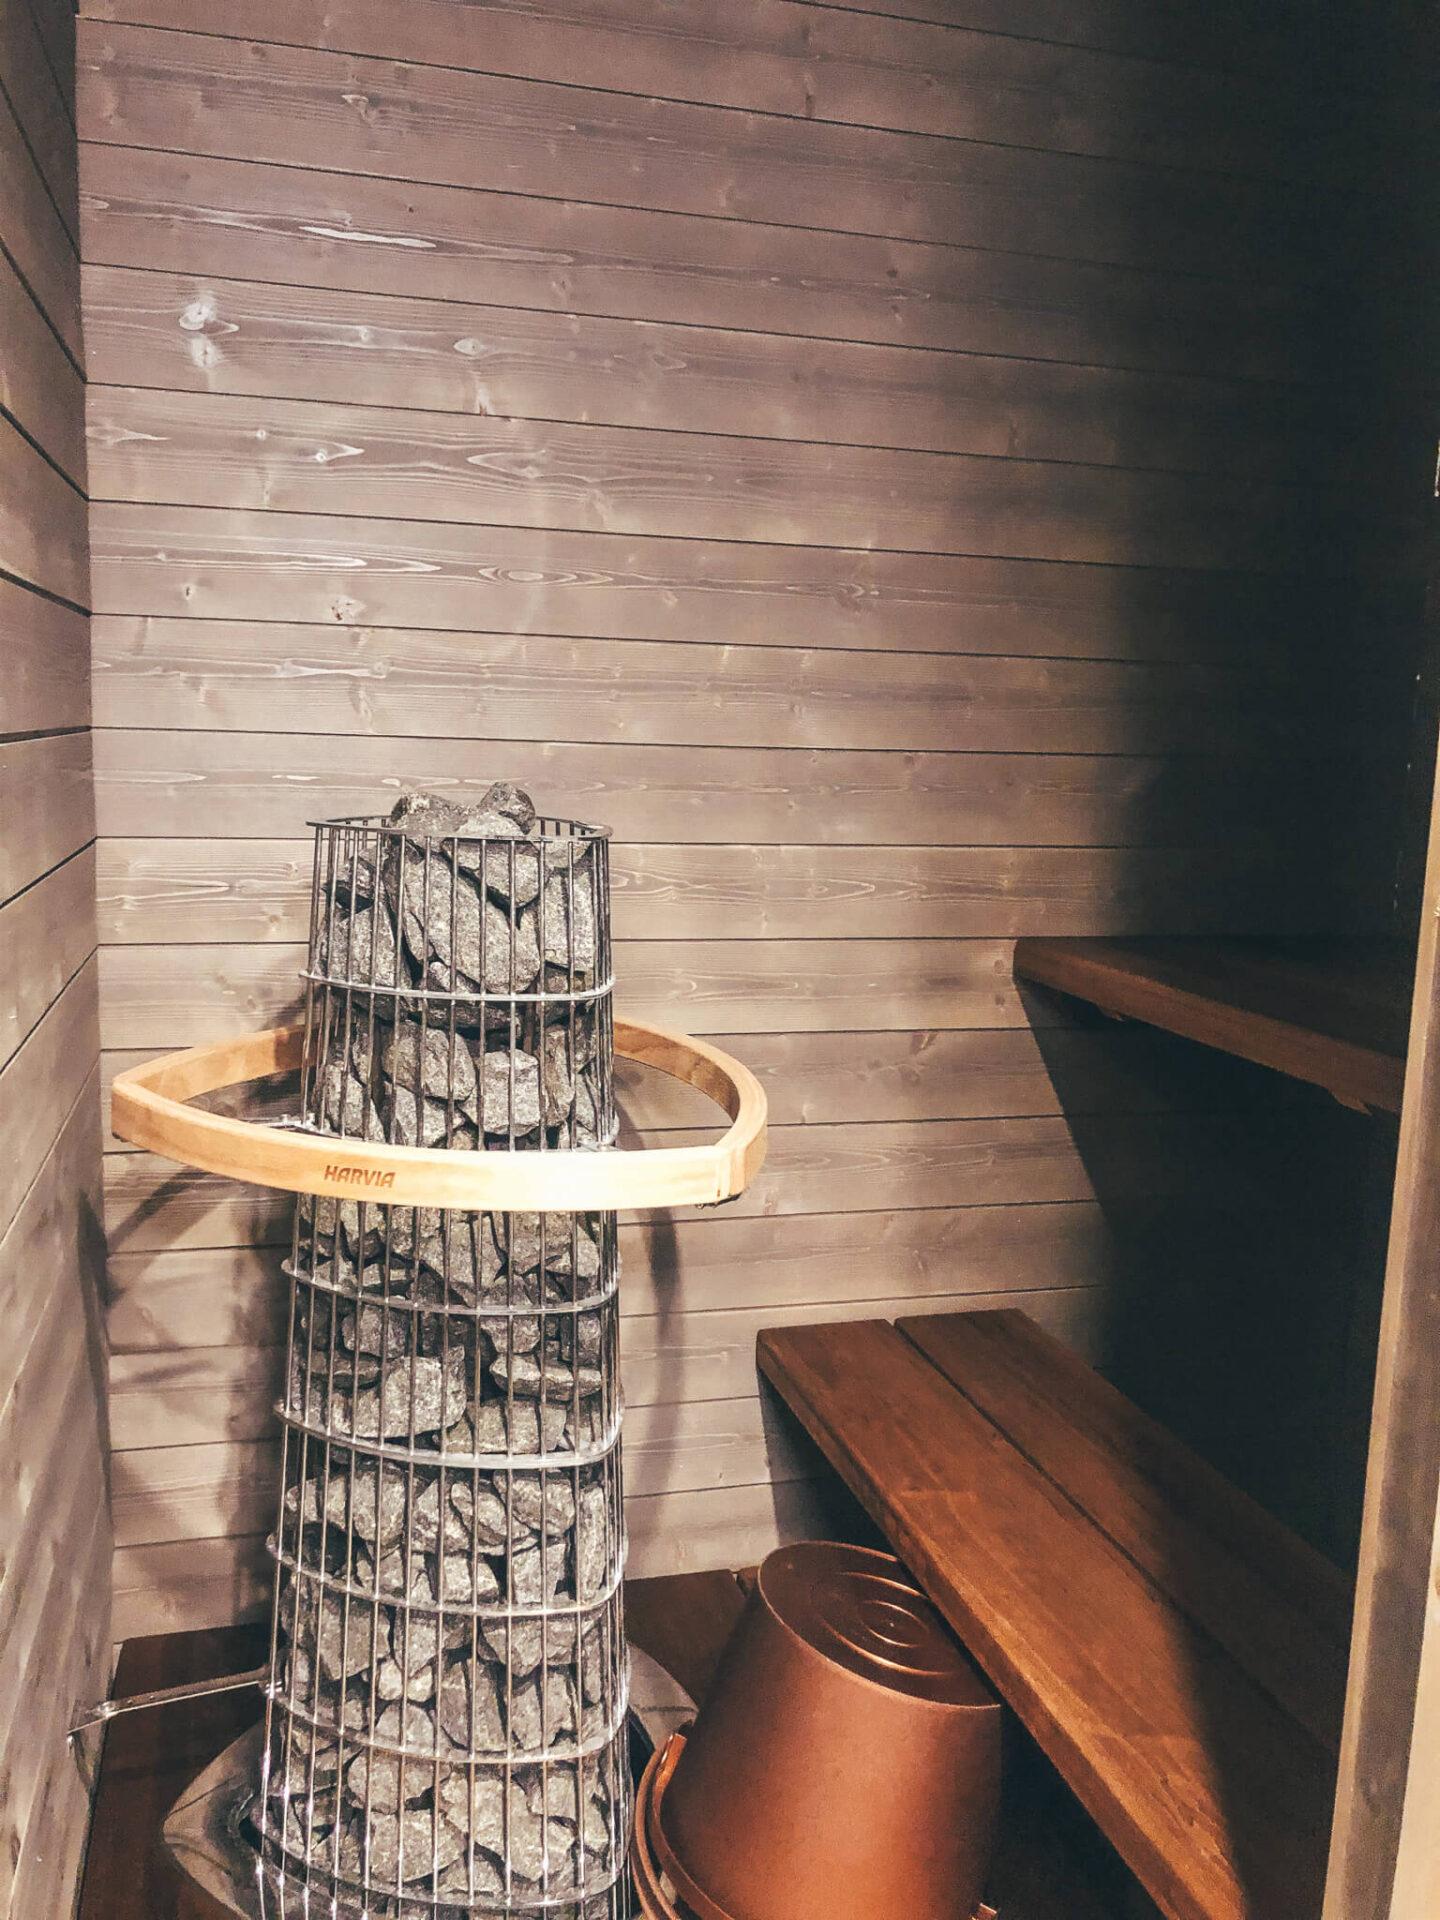 A wooden finnish sauna